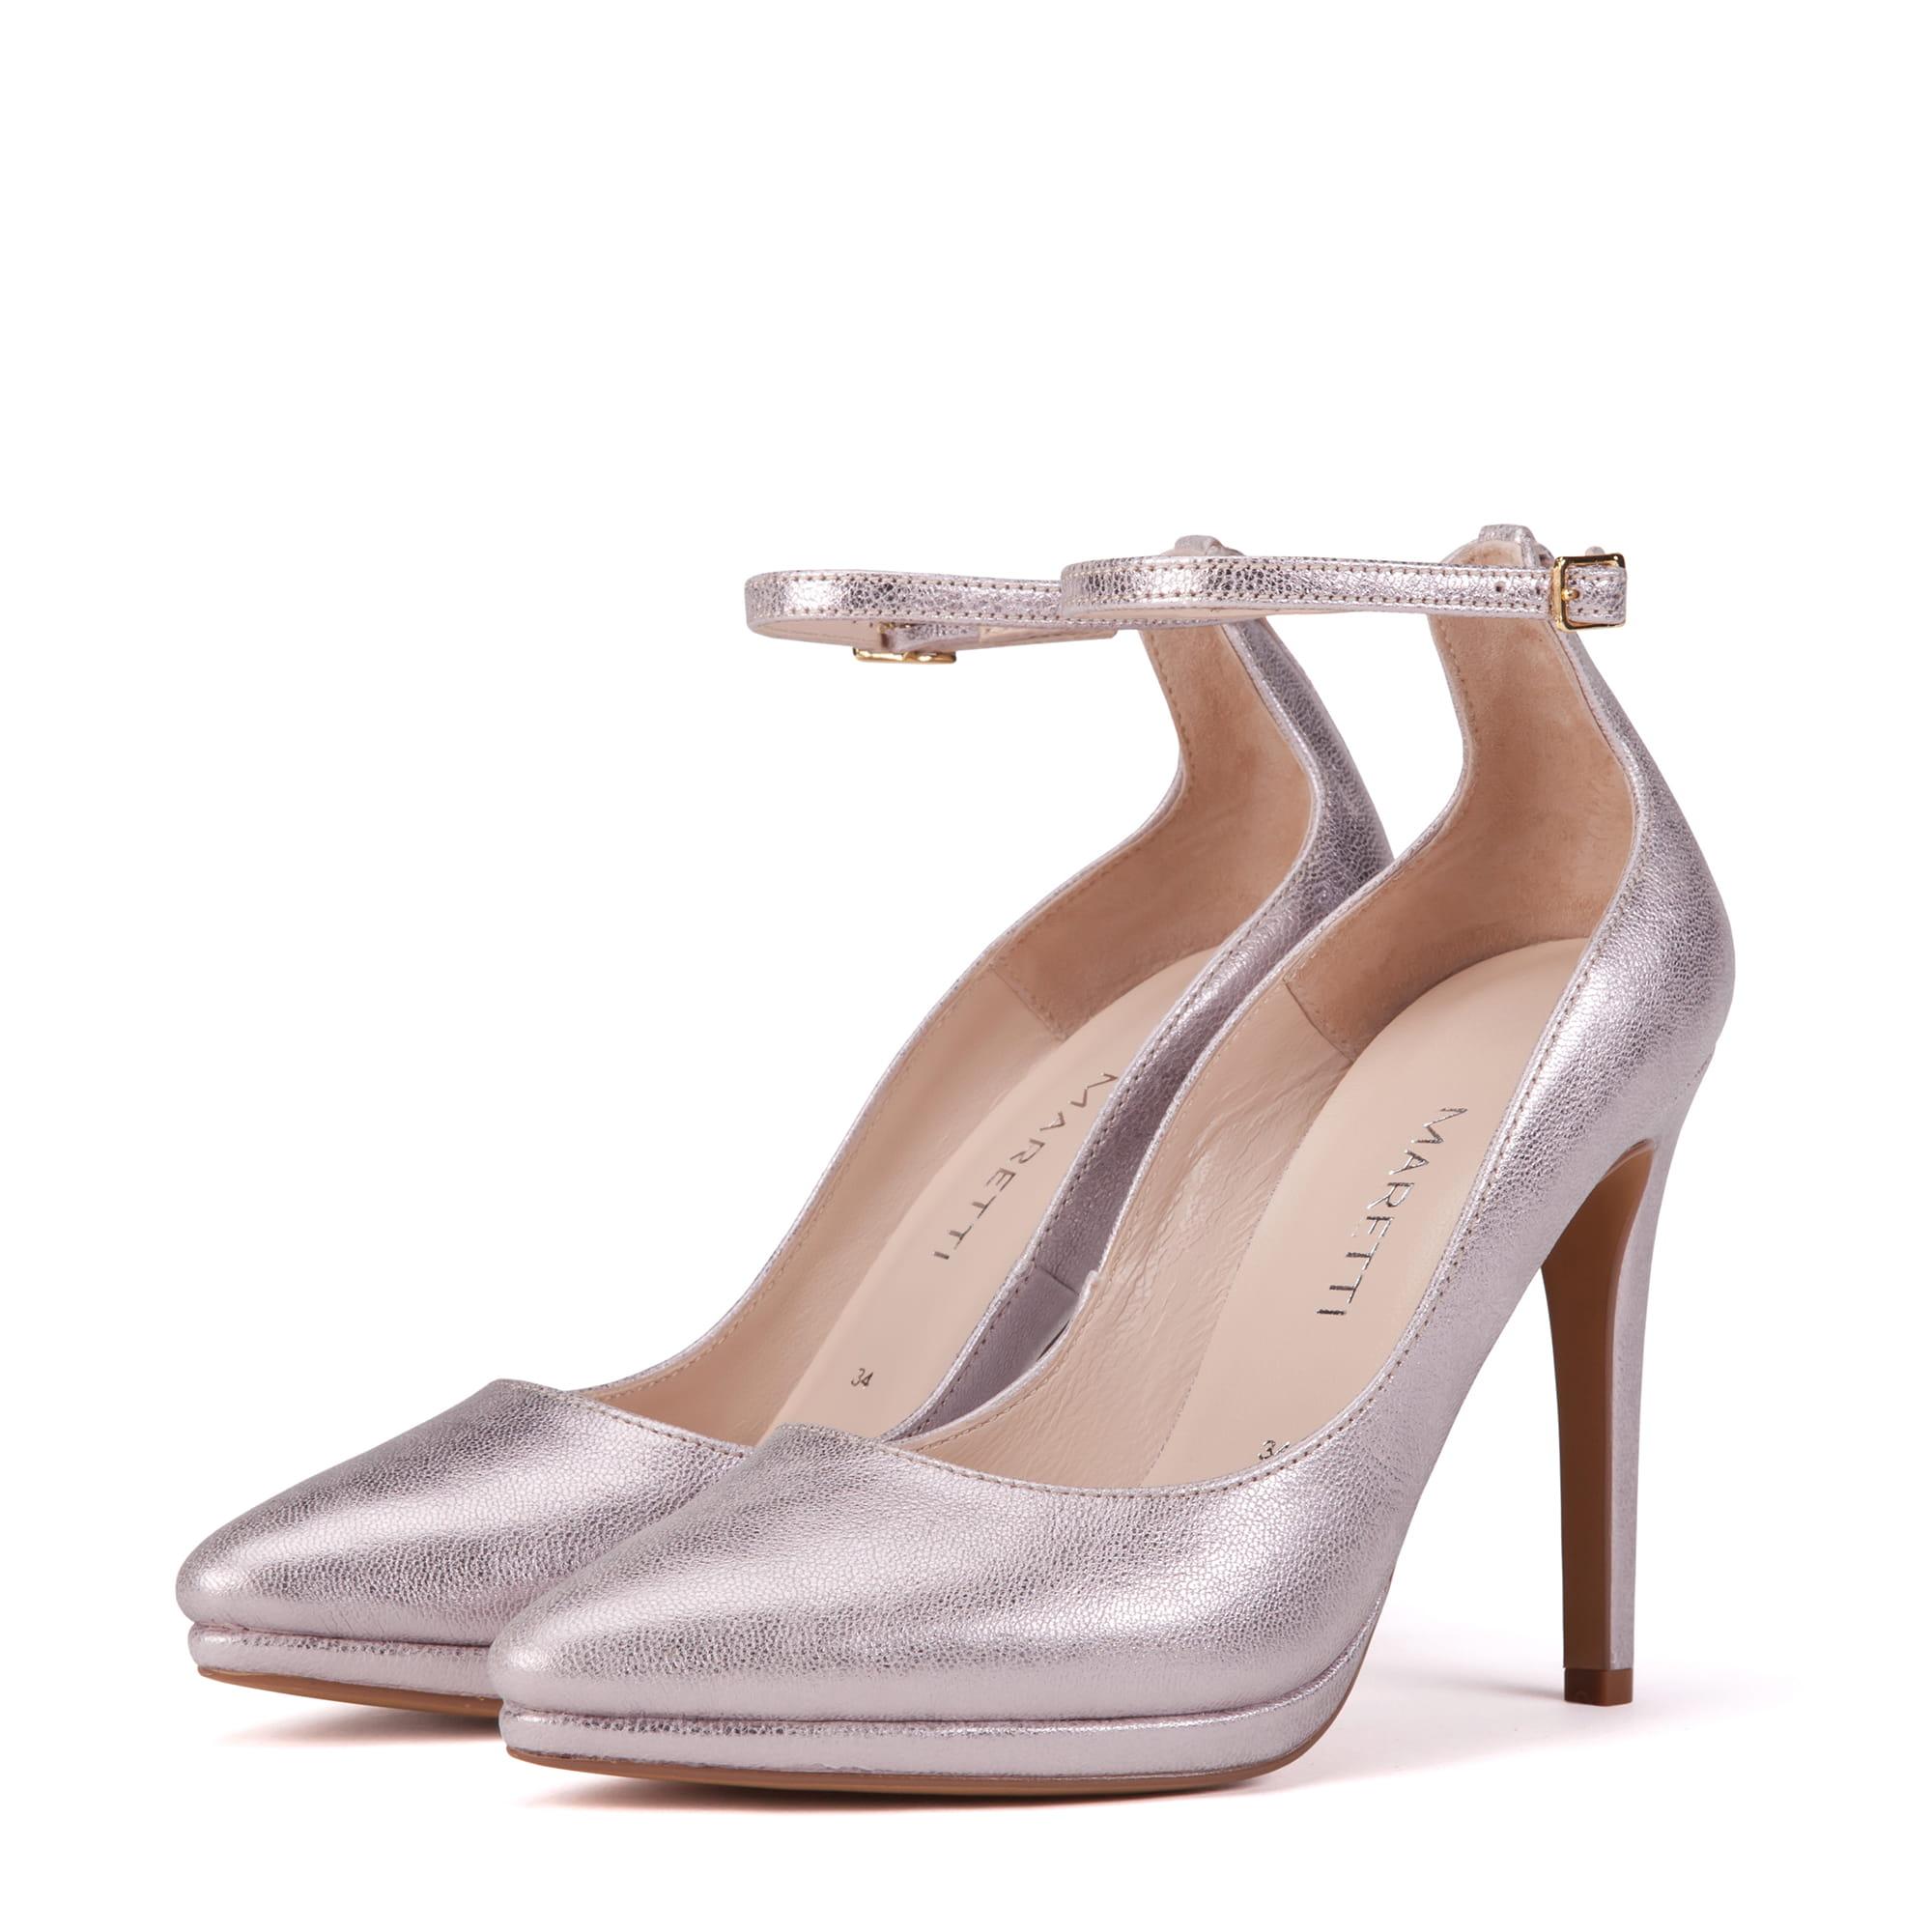 275e4903 Małe buty damskie. Małe rozmiary 32-35. MARETTI PETITE SHOES 1401-16 ...